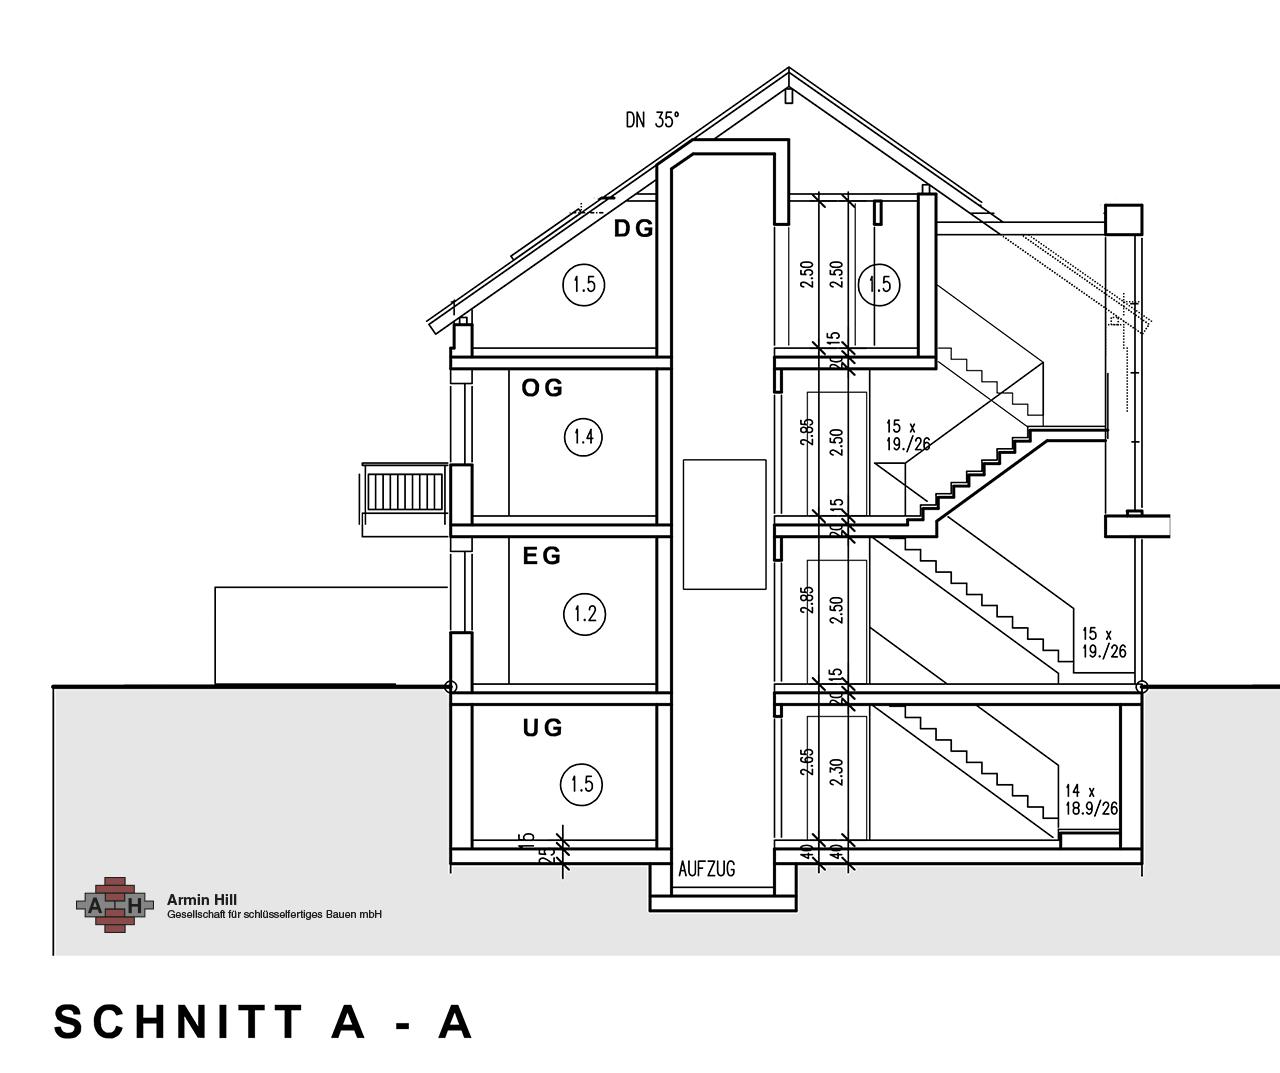 wohnung 1 5 ober olm 3 zimmer 129 qm hill bauunternehmen. Black Bedroom Furniture Sets. Home Design Ideas